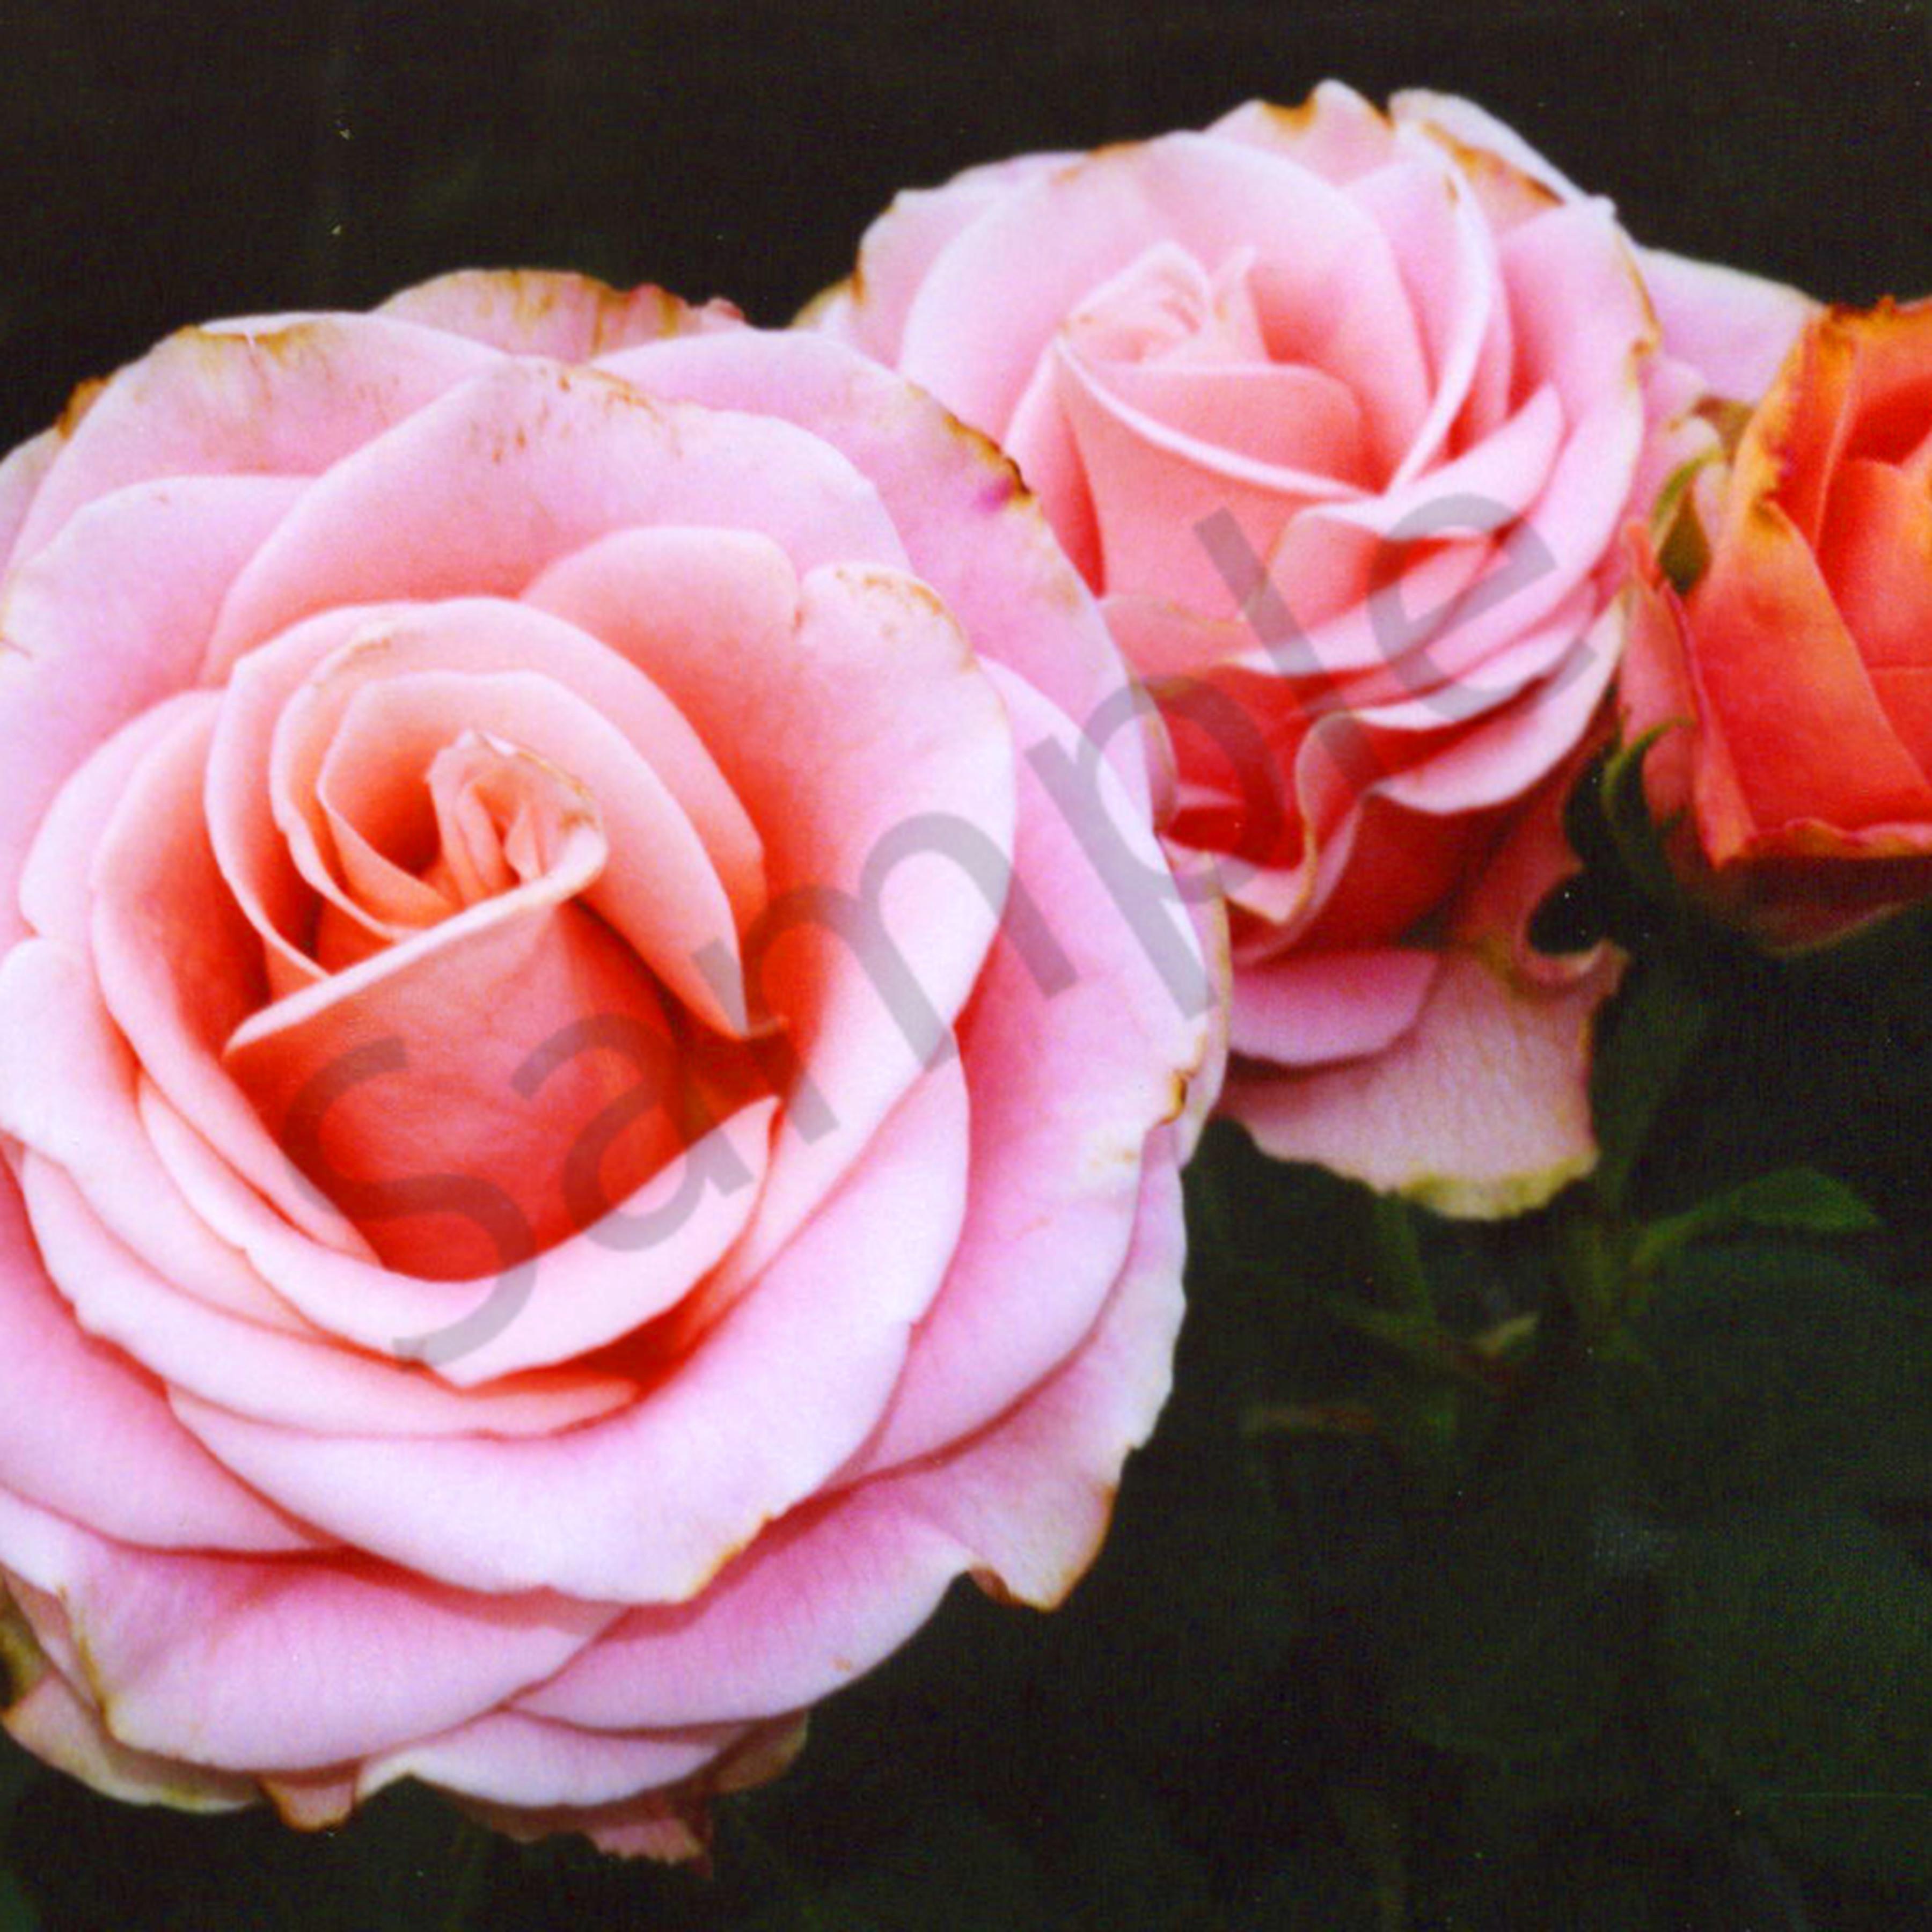 Pink roses website weoitw